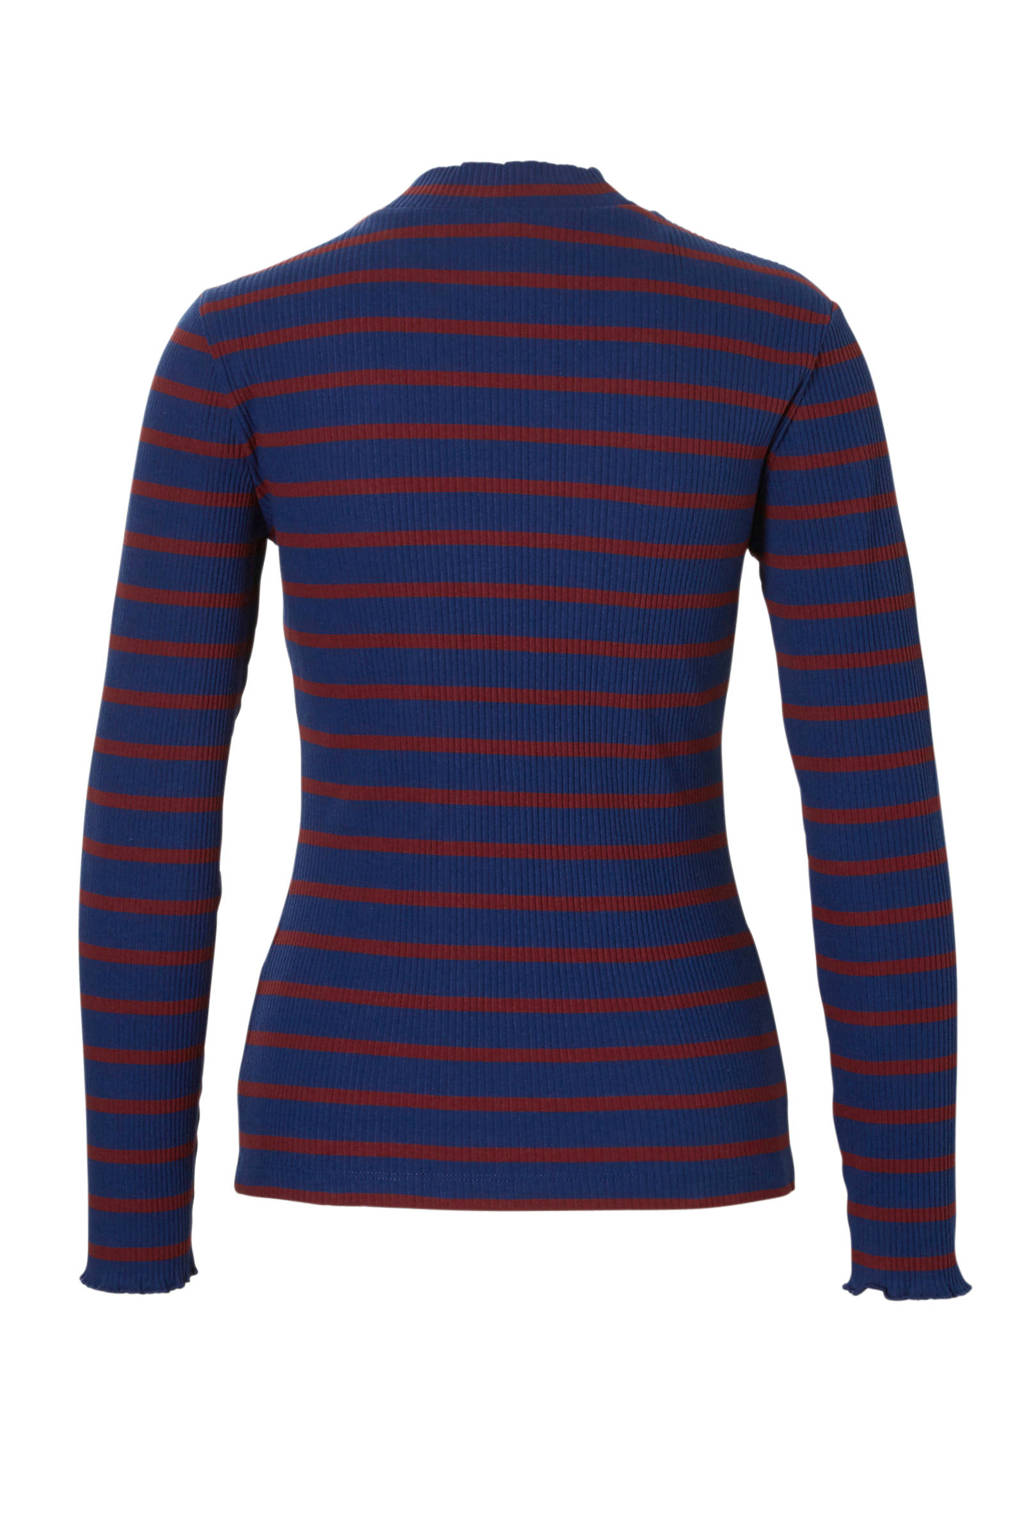 ONLY gestreepte trui, Blauw/rood